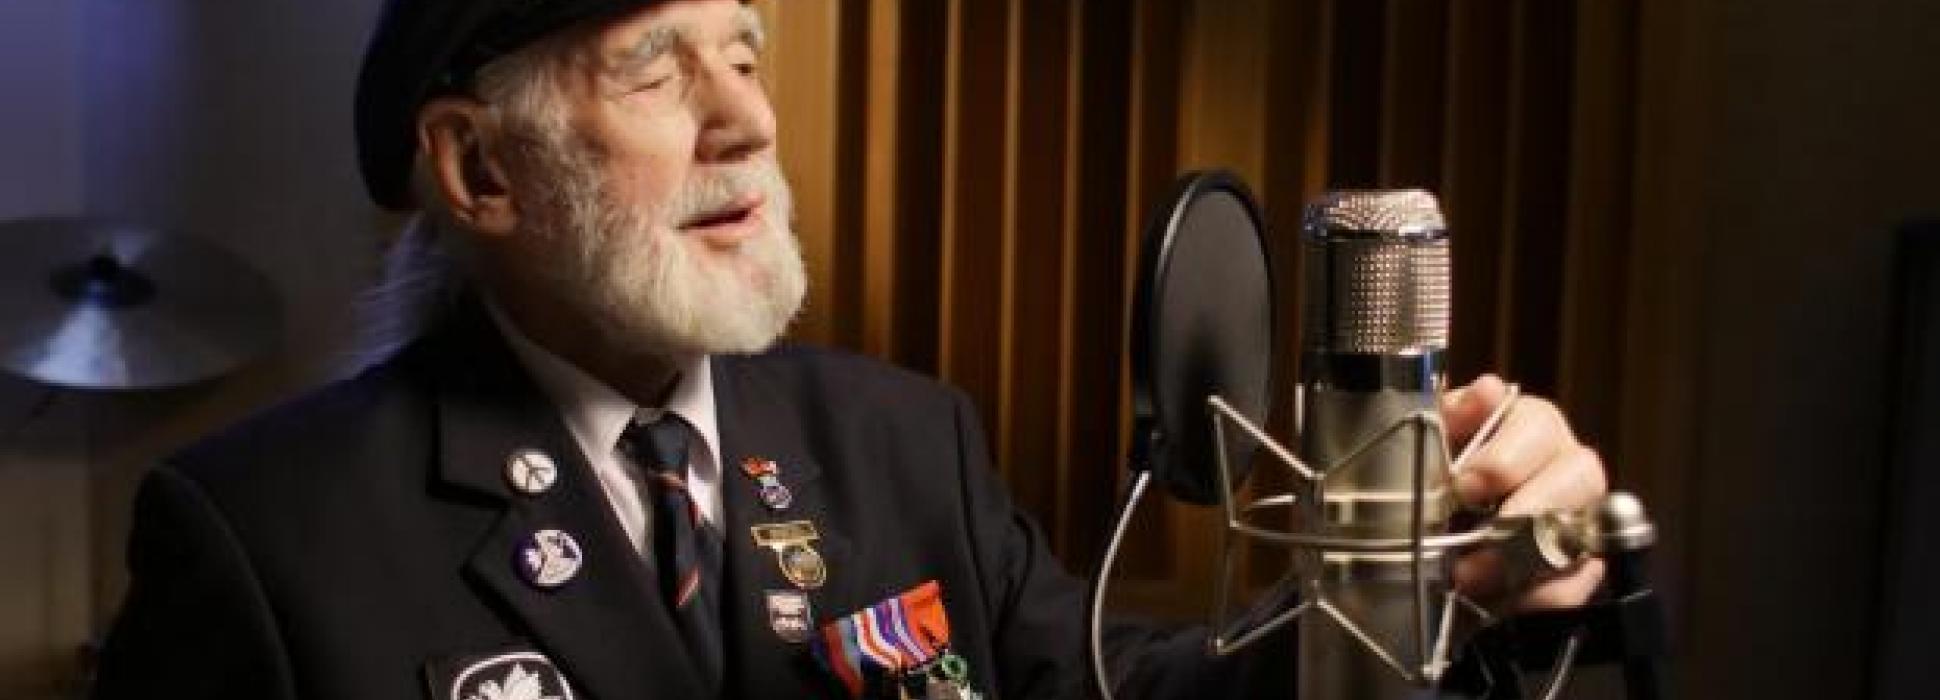 "World War II veteran Jim Radford makes a buzz on the Amazon platform with his folk ballad ""The Shores of Normandy"""